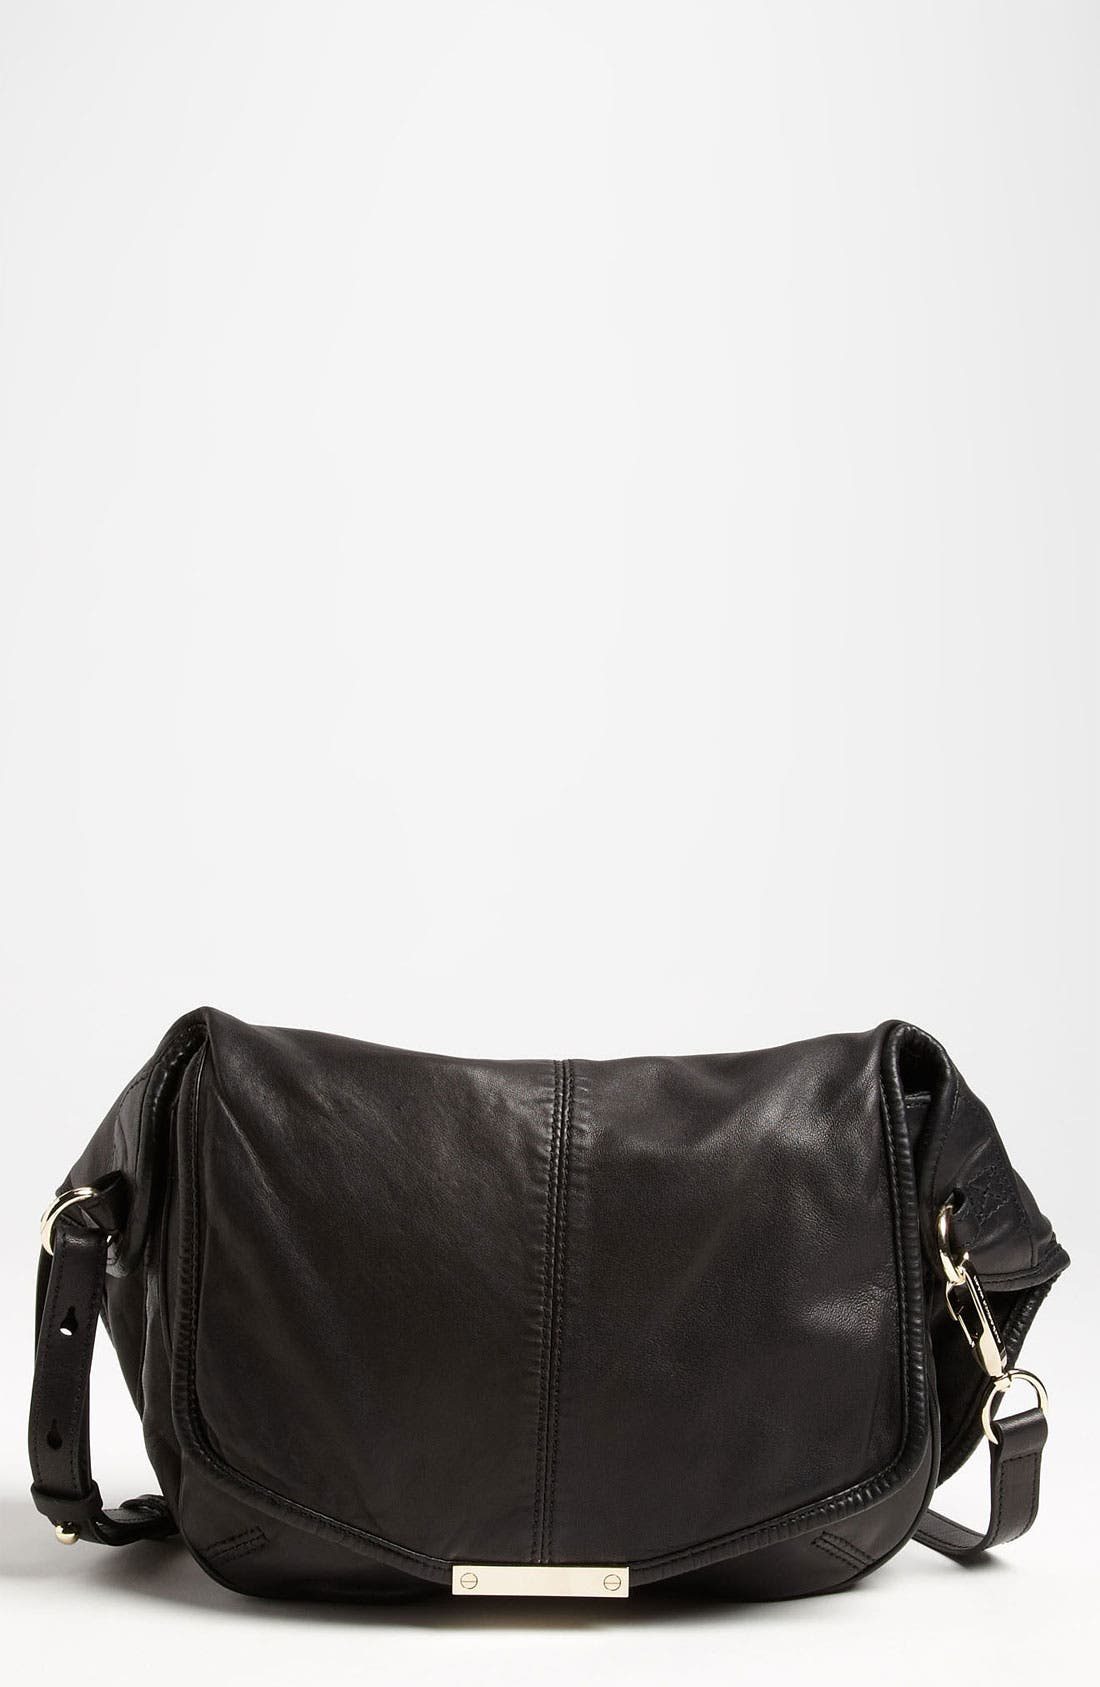 Main Image - Alexander Wang 'Iris' Leather Crossbody Bag